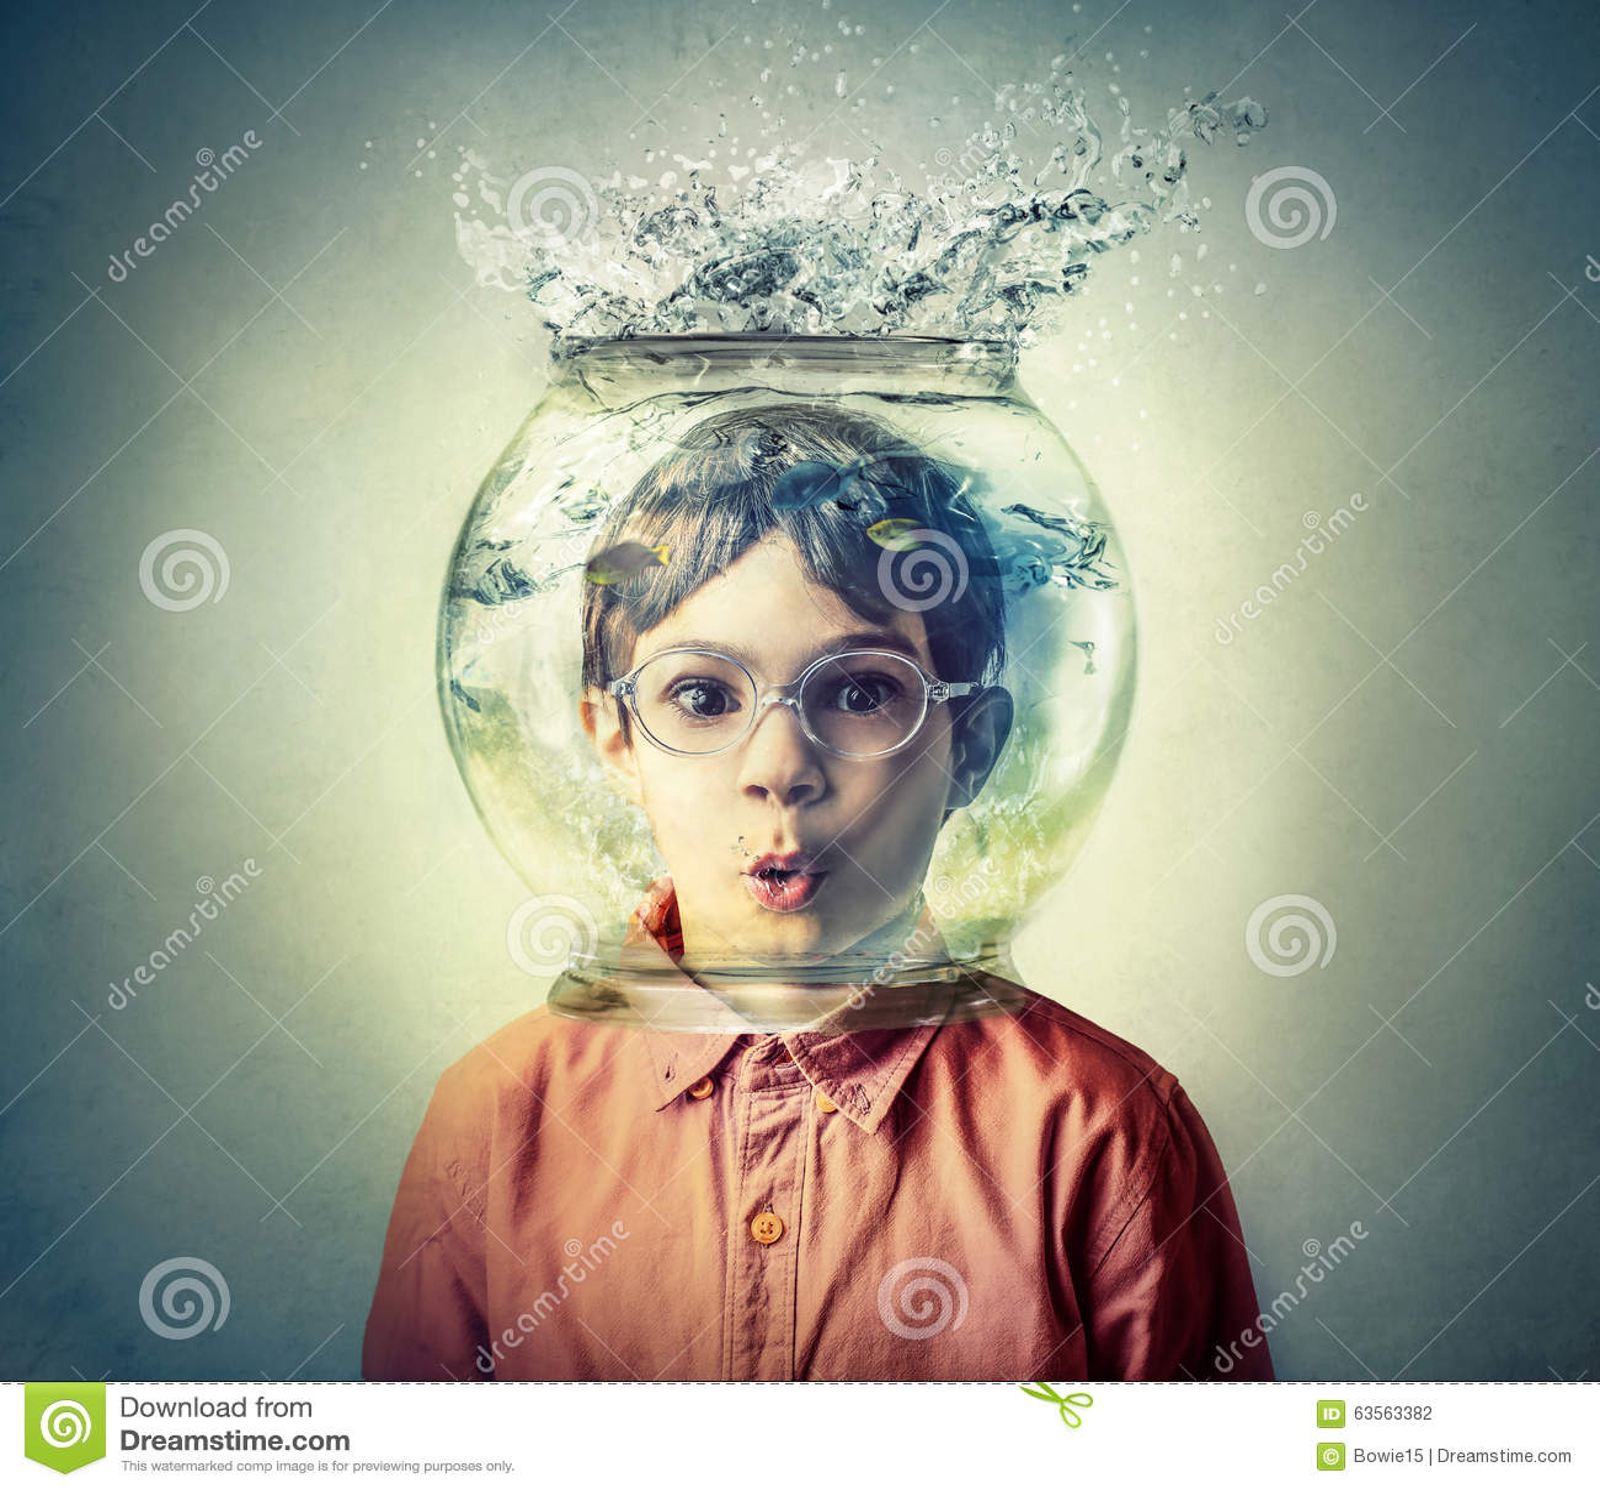 Under vatten